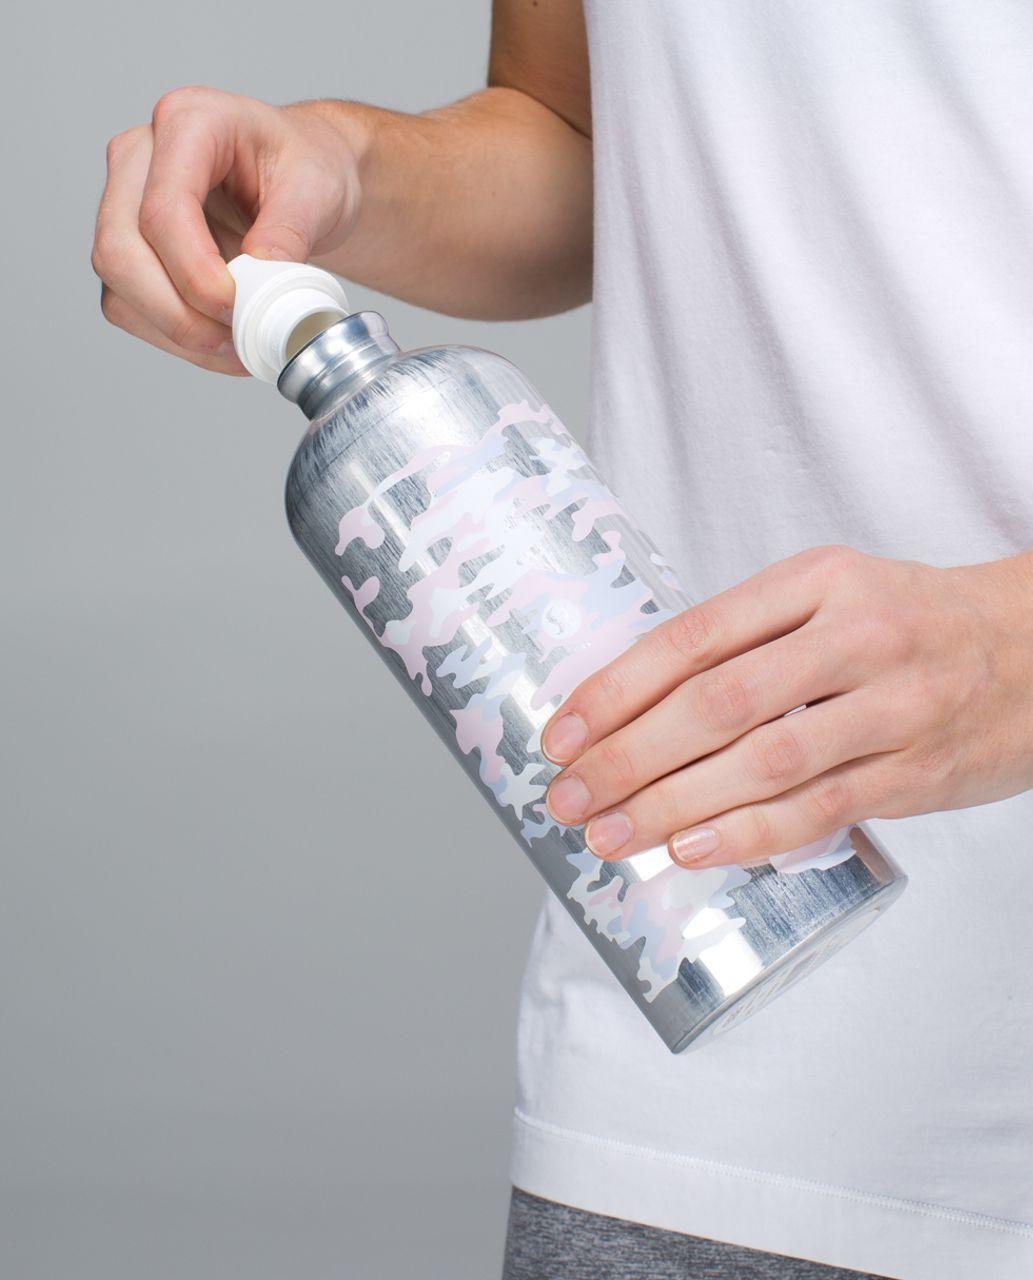 Lululemon Sigg 1L Water Bottle - Hide And Seek Camo Neutral Blush Early Blue